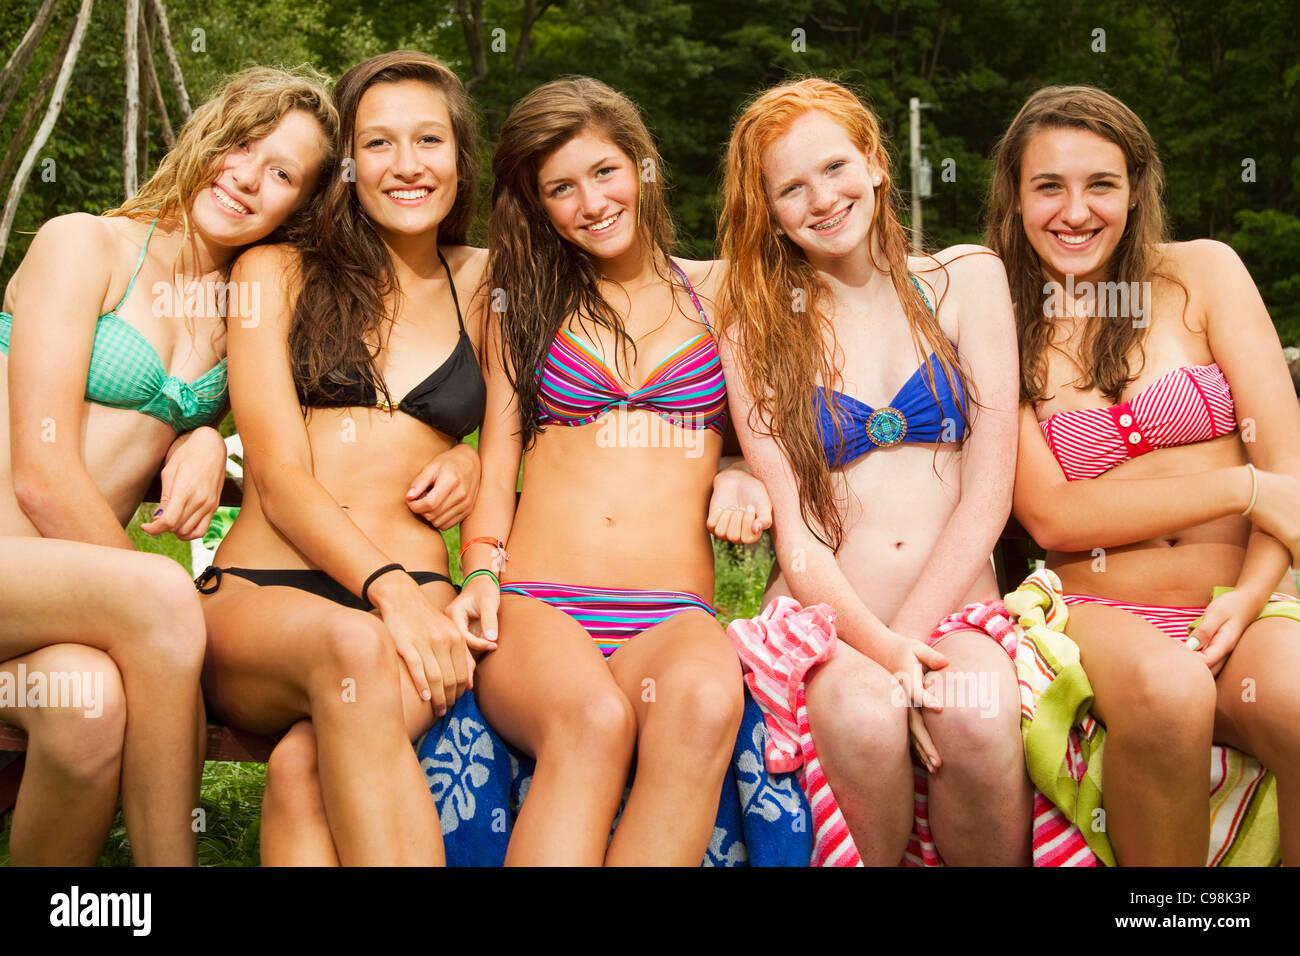 Cute Korean Wallpaper For Cell Phones Five Teenage Girls Sitting On Picnic Table Bikinis Stock